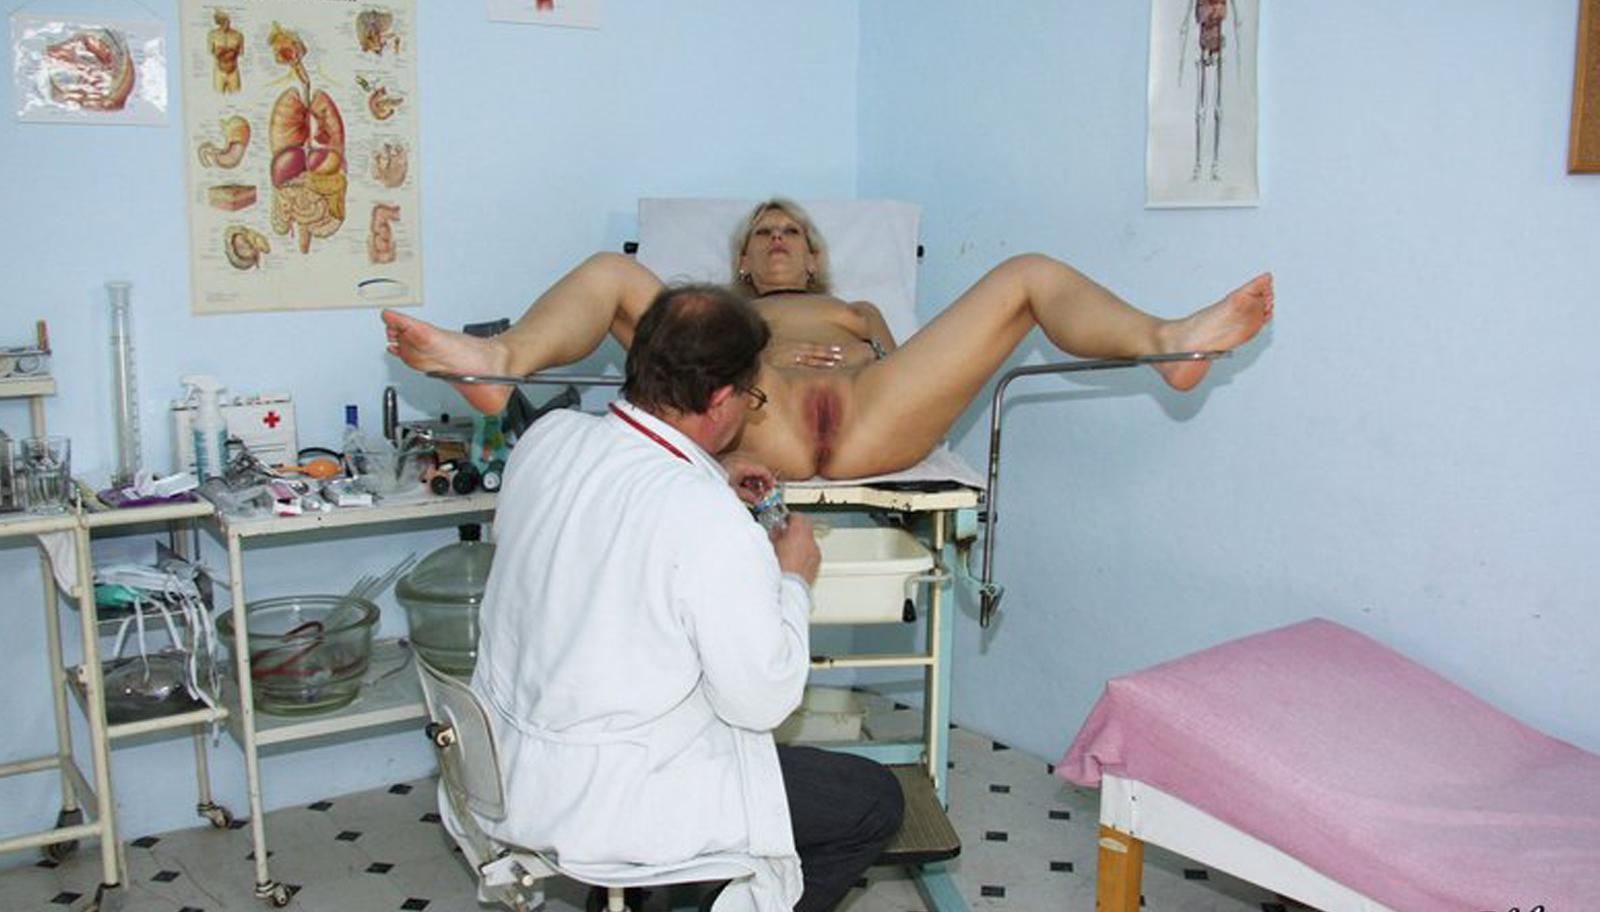 sexo no medico www conviviocm pt faro